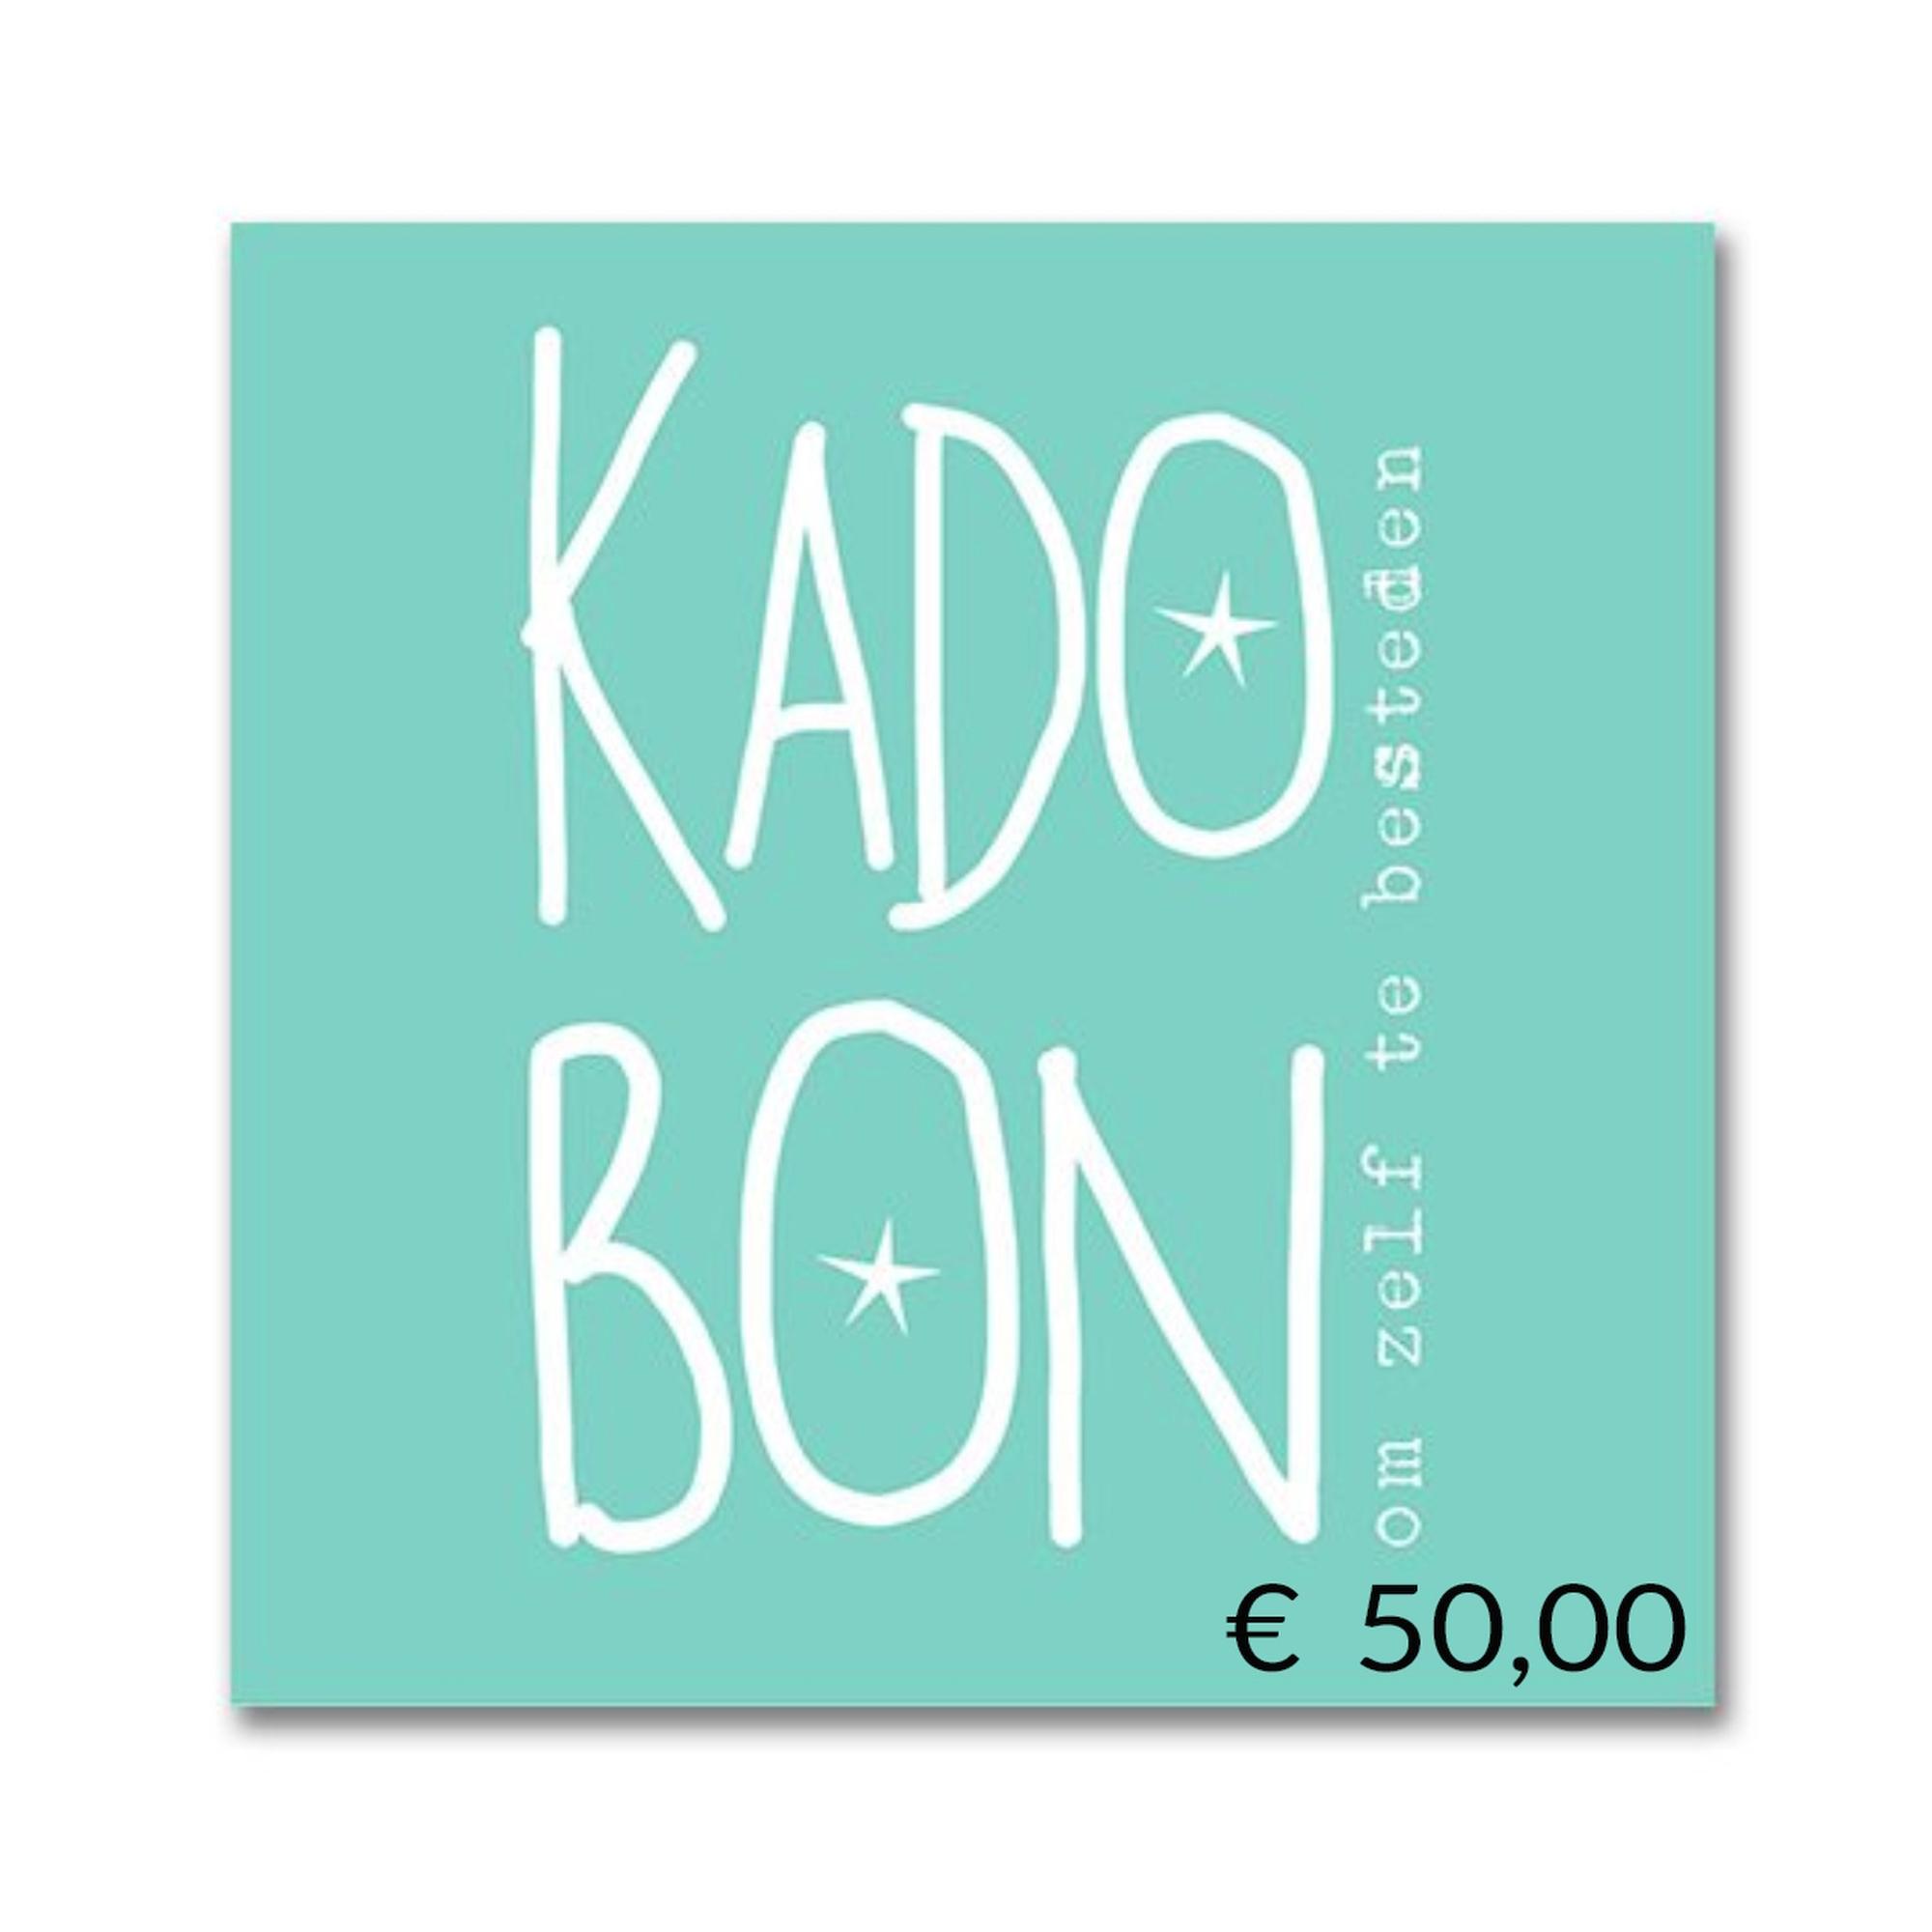 Steenwijk Schoenmode Kadobon Eur 50,00